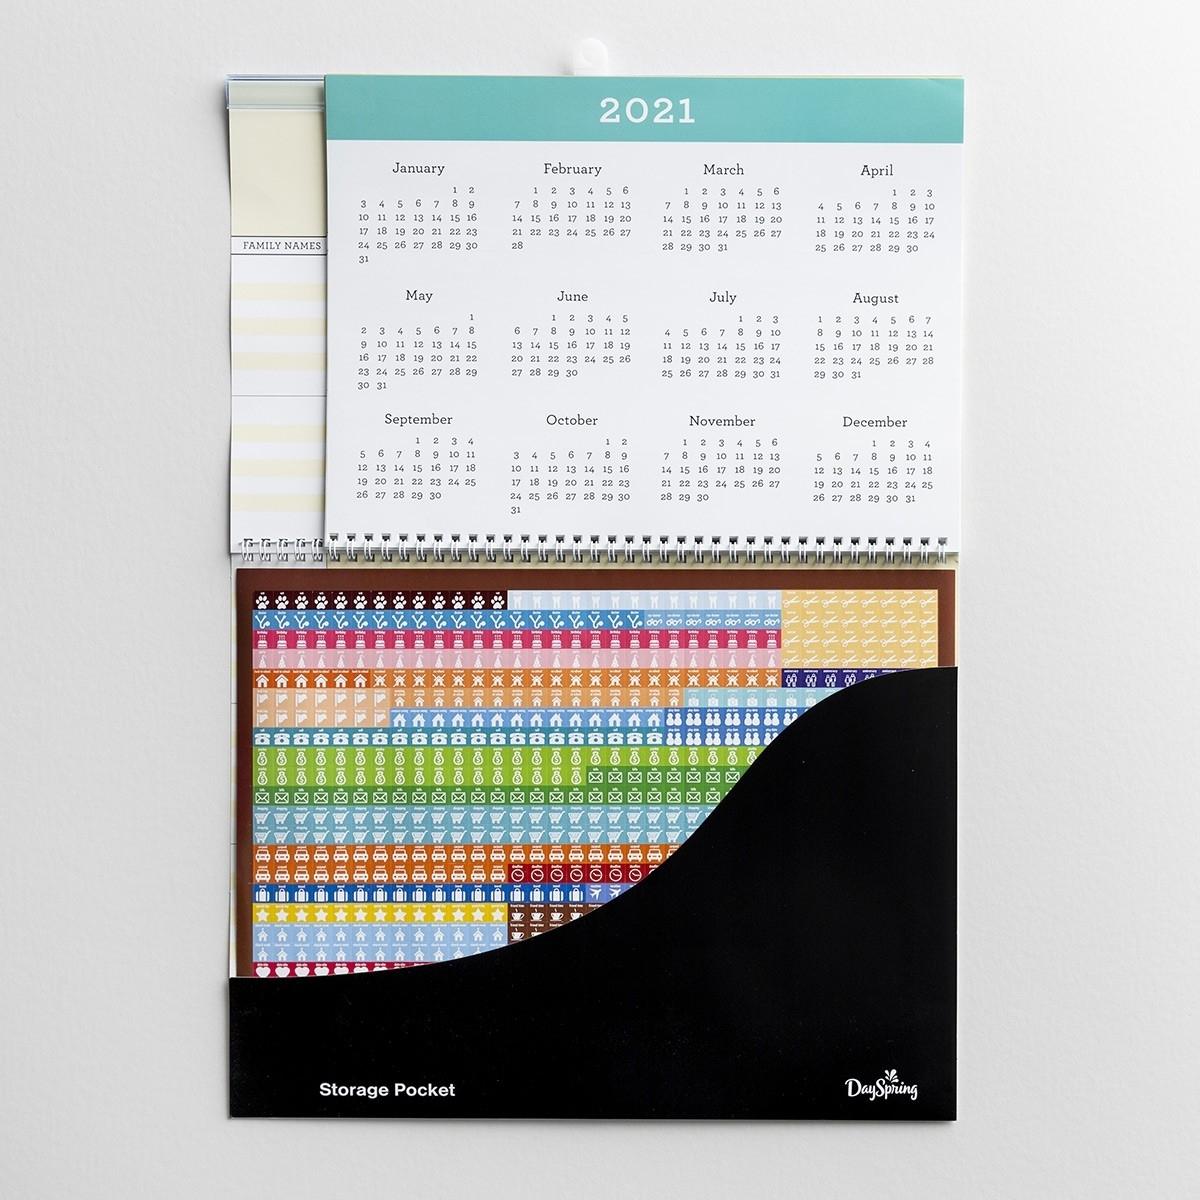 Peanuts - 2020 Family Planner Wall Calendar